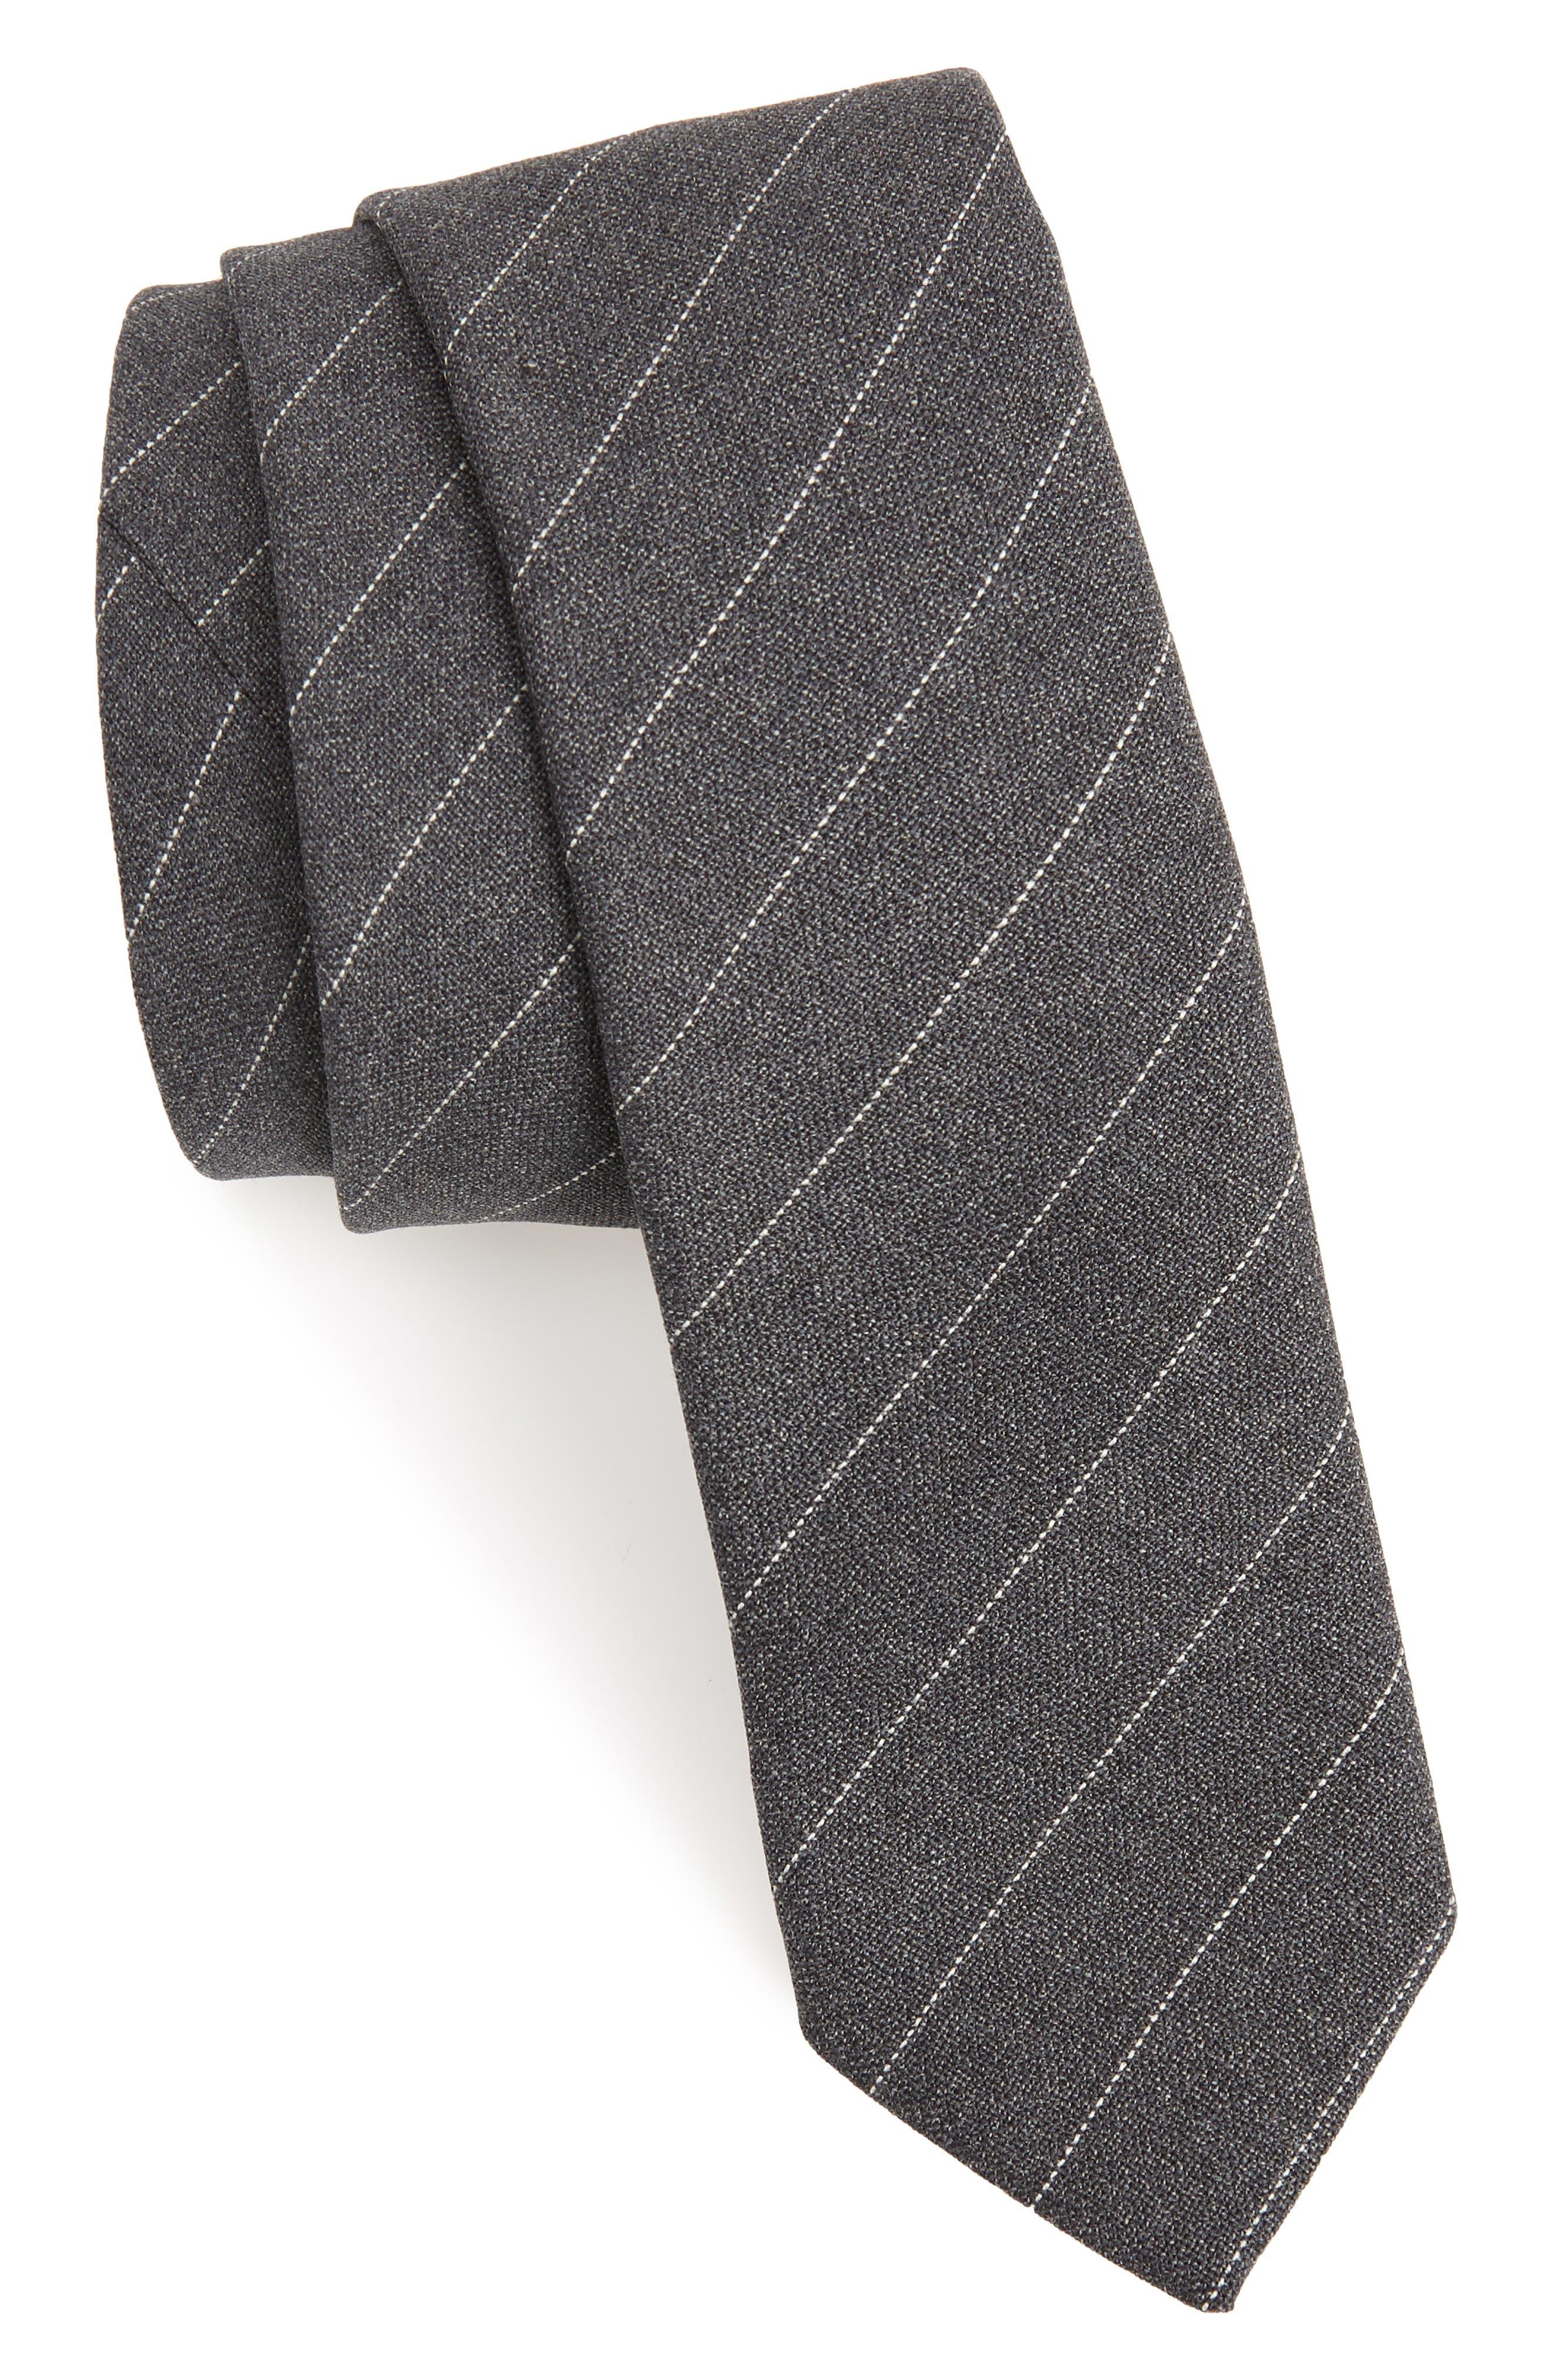 Stripe Wool Tie,                         Main,                         color, Dark Grey